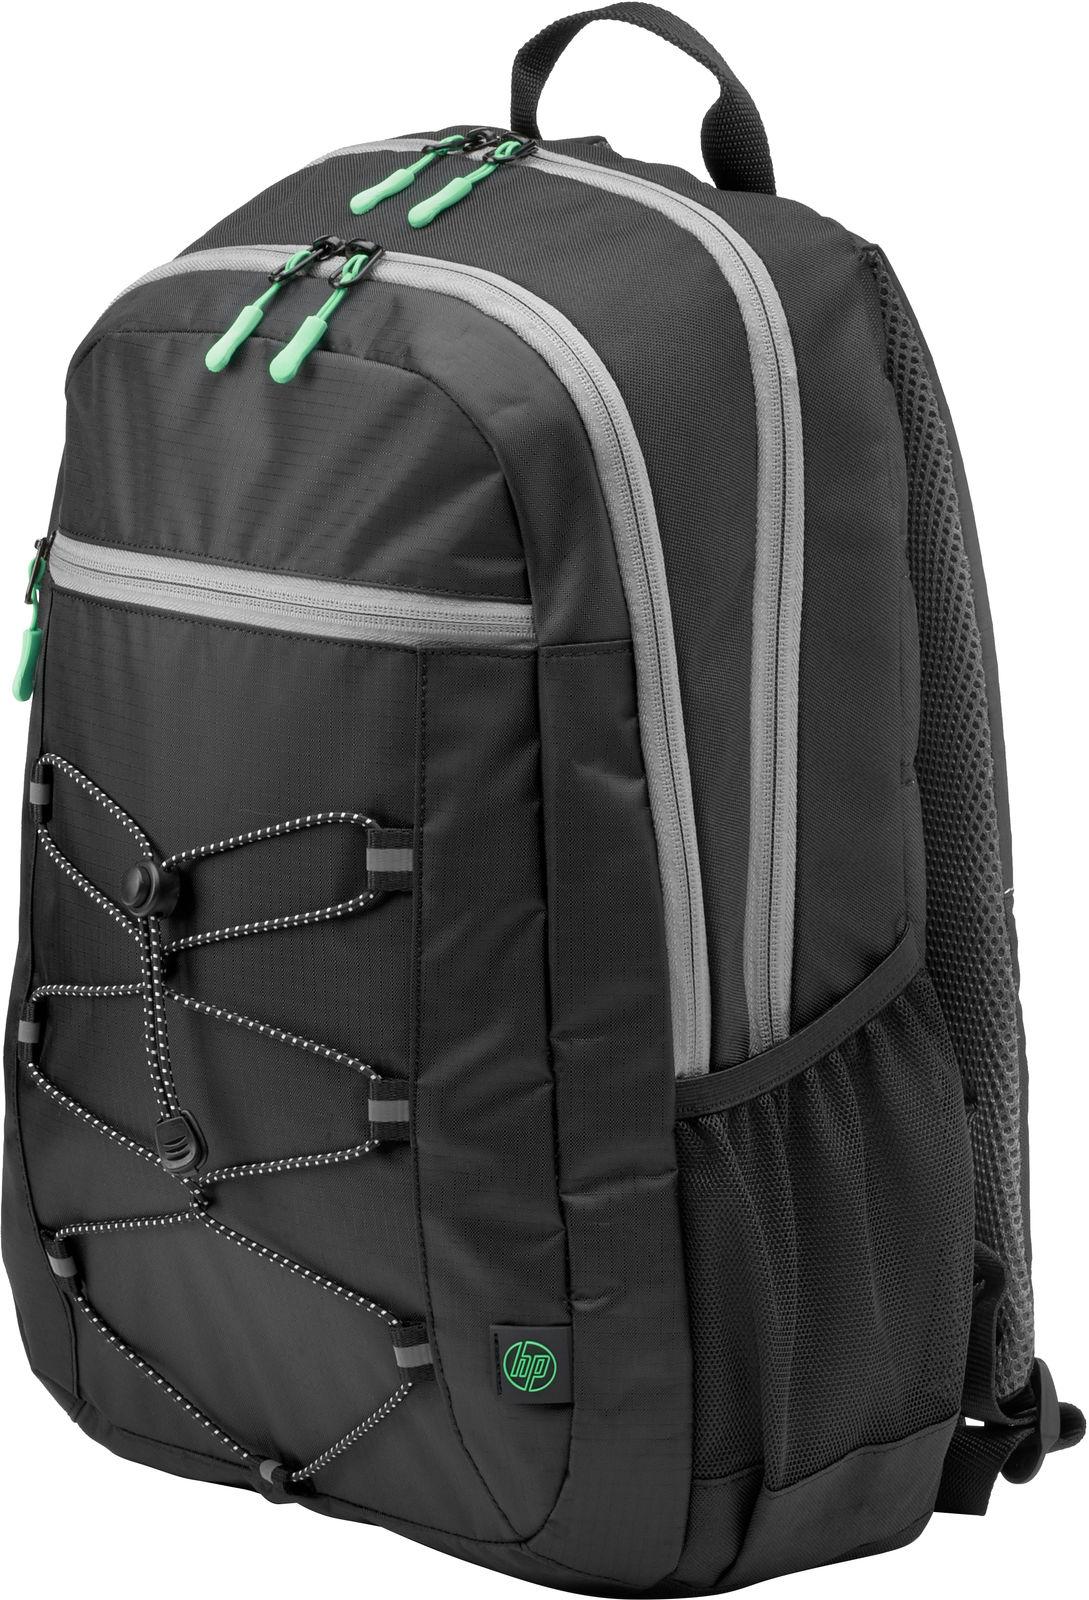 HP 15.6 Active Black Backpack **New Retail** 1LU22AA - eet01